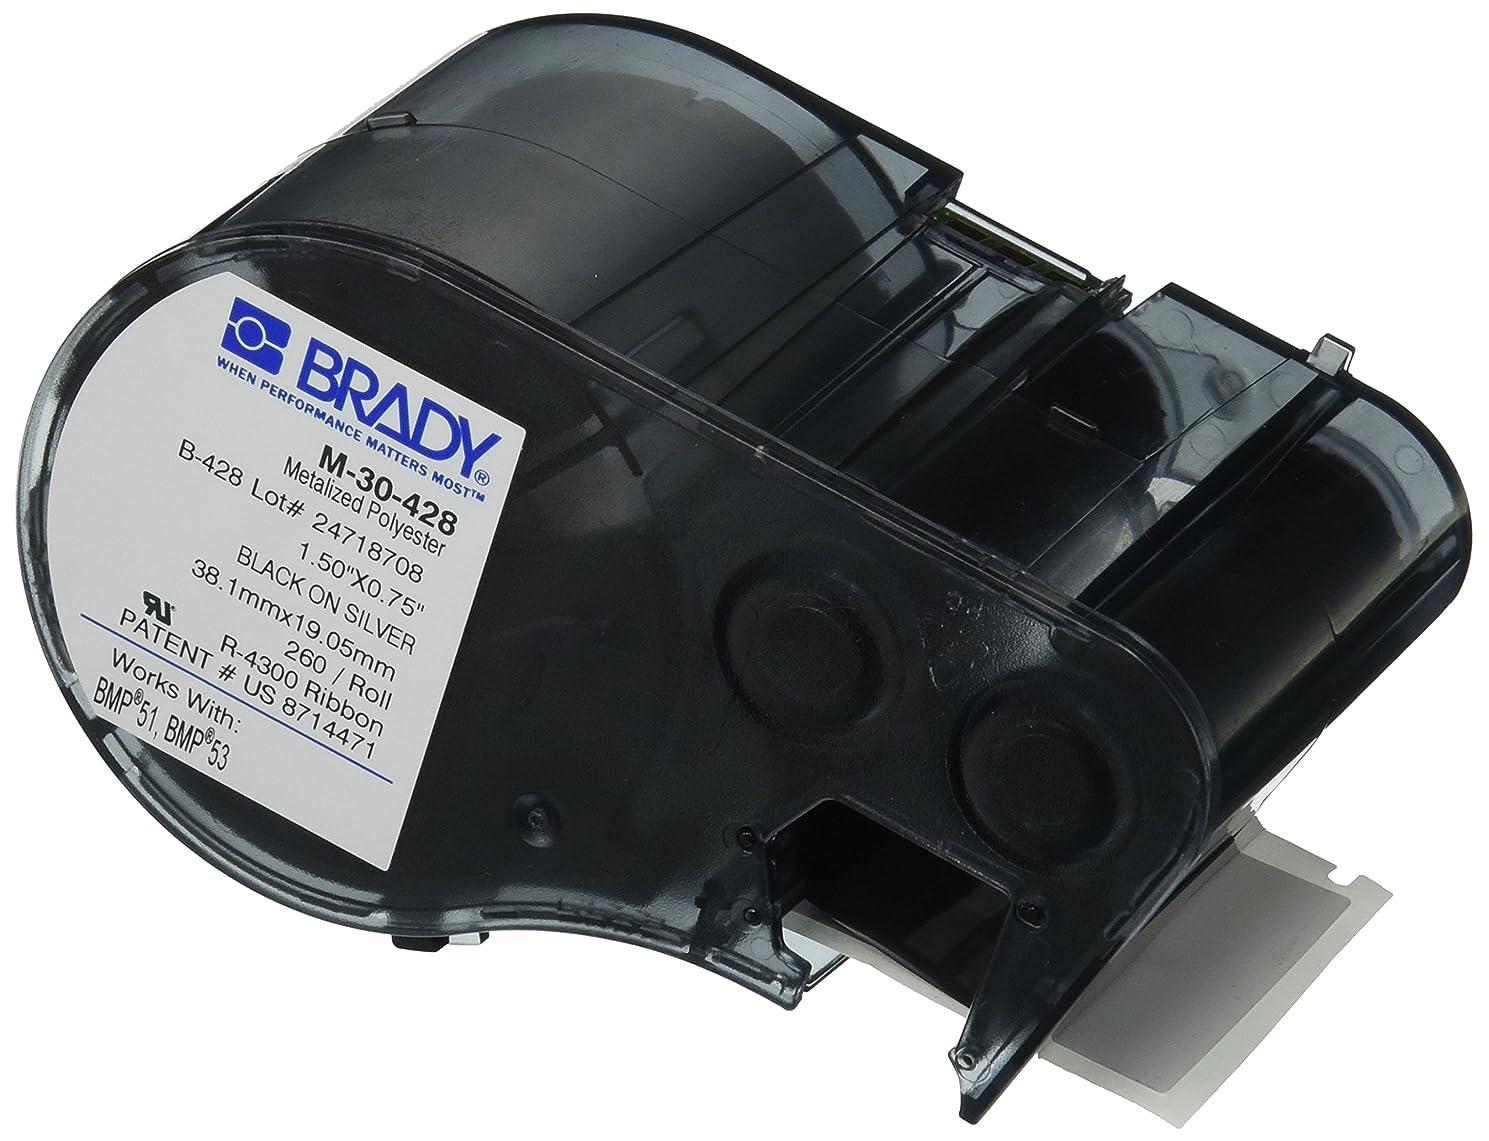 Brady M-30-428 Polyester B-428 Black on Silver Label Maker Cartridge, 3/4